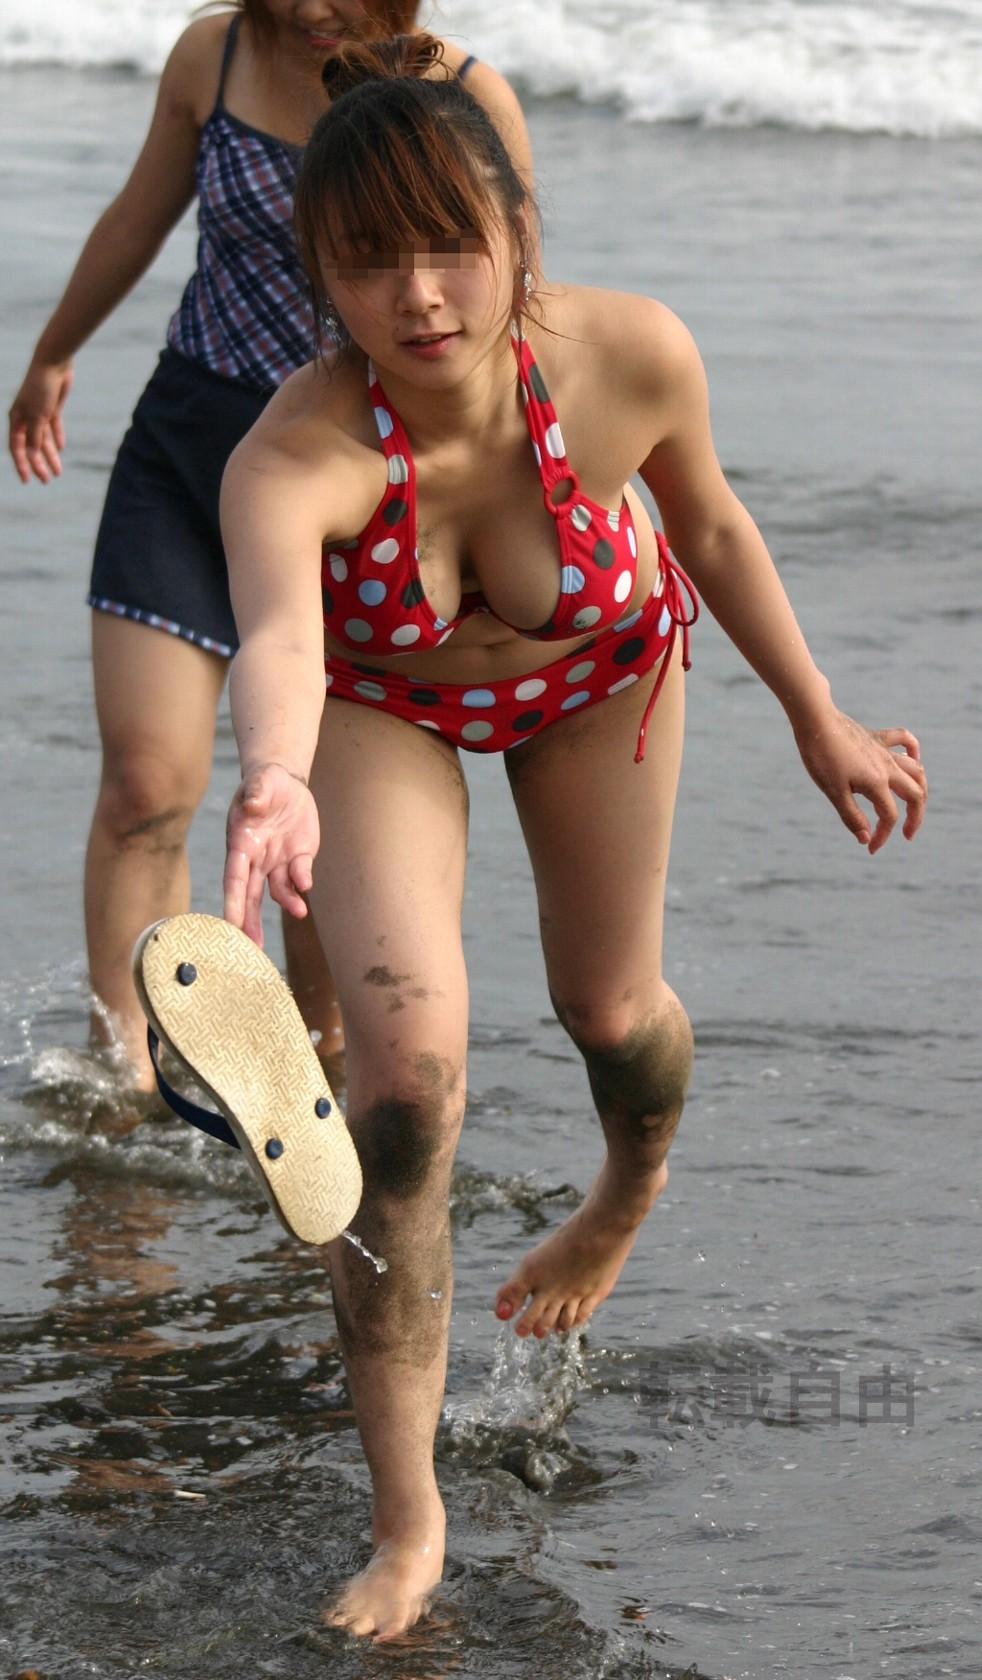 素人の水着画像がぐうシコでマジ感謝wwwwwwwwwwww BawxwdV